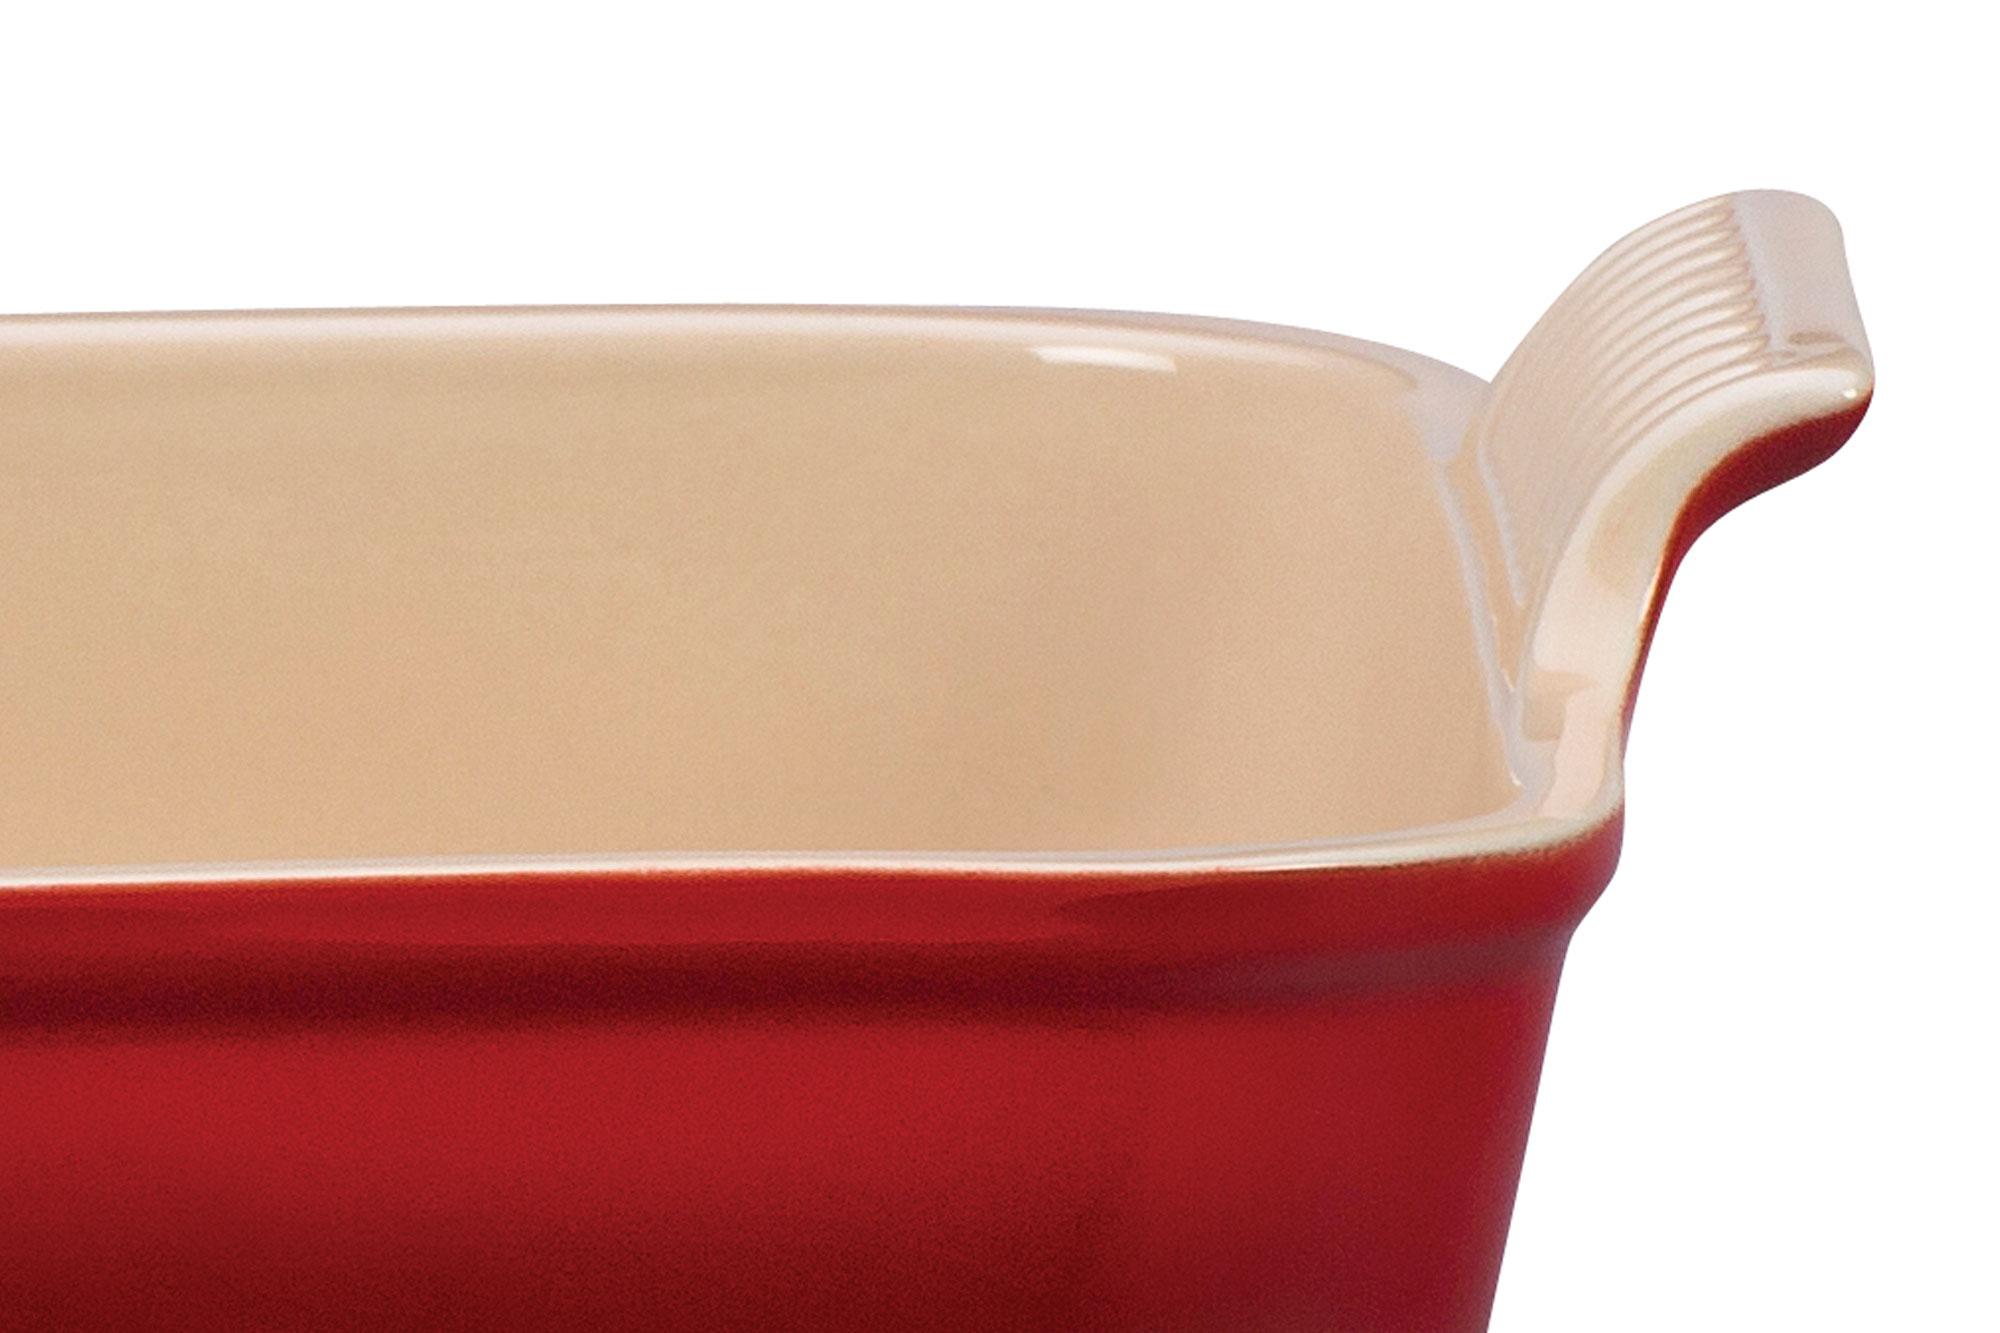 Le Creuset Stoneware Heritage Bakeware Set 3 Piece Cherry